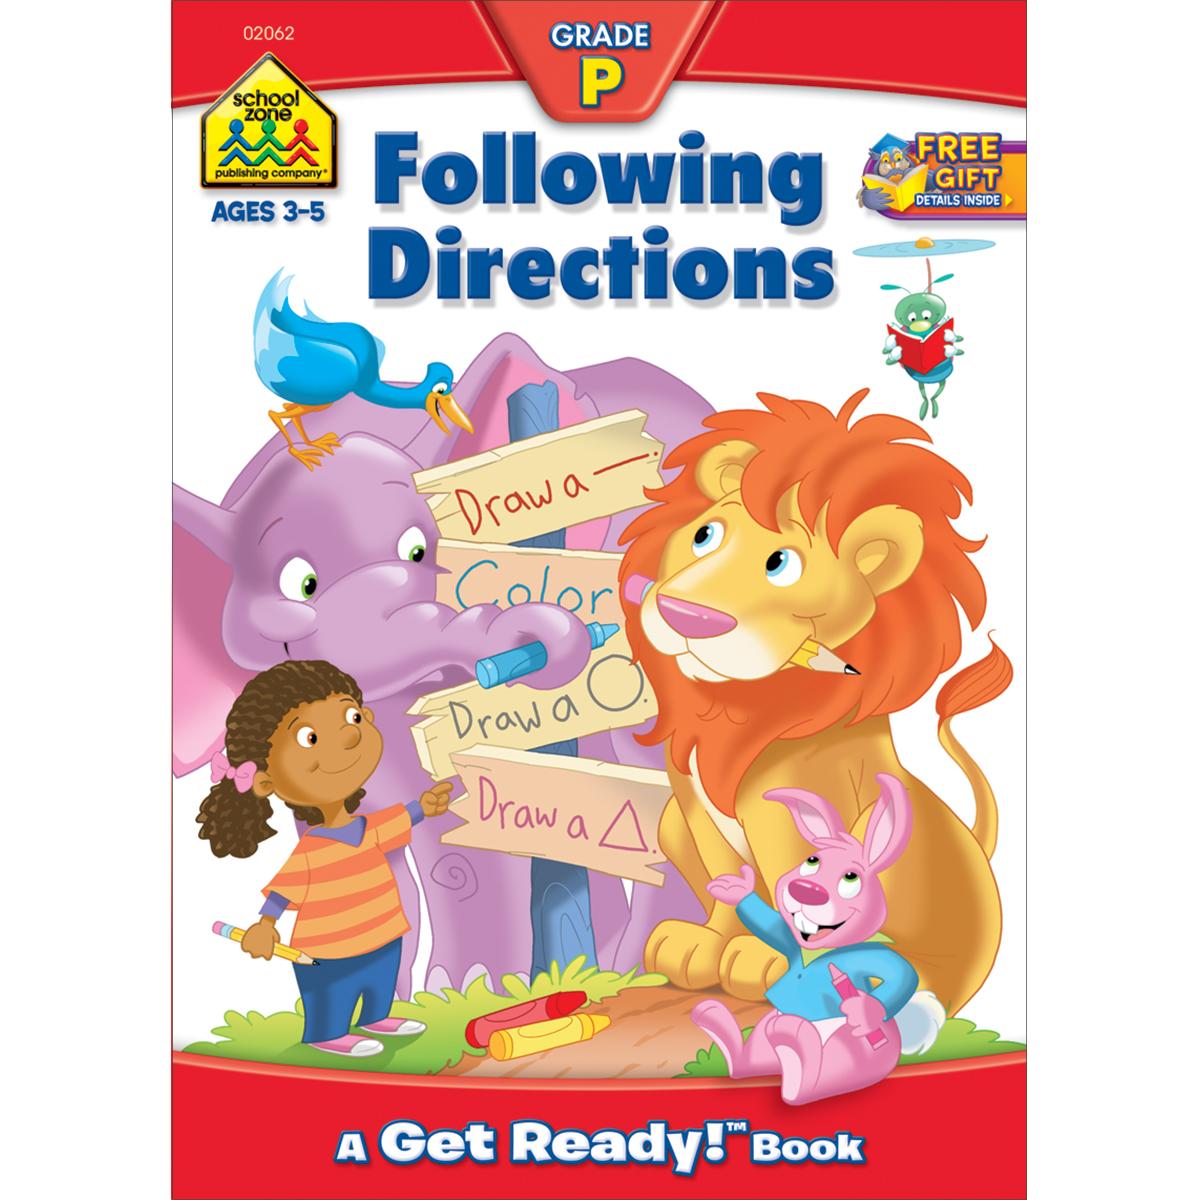 Preschool Workbooks-Following Directions Ages 3-5